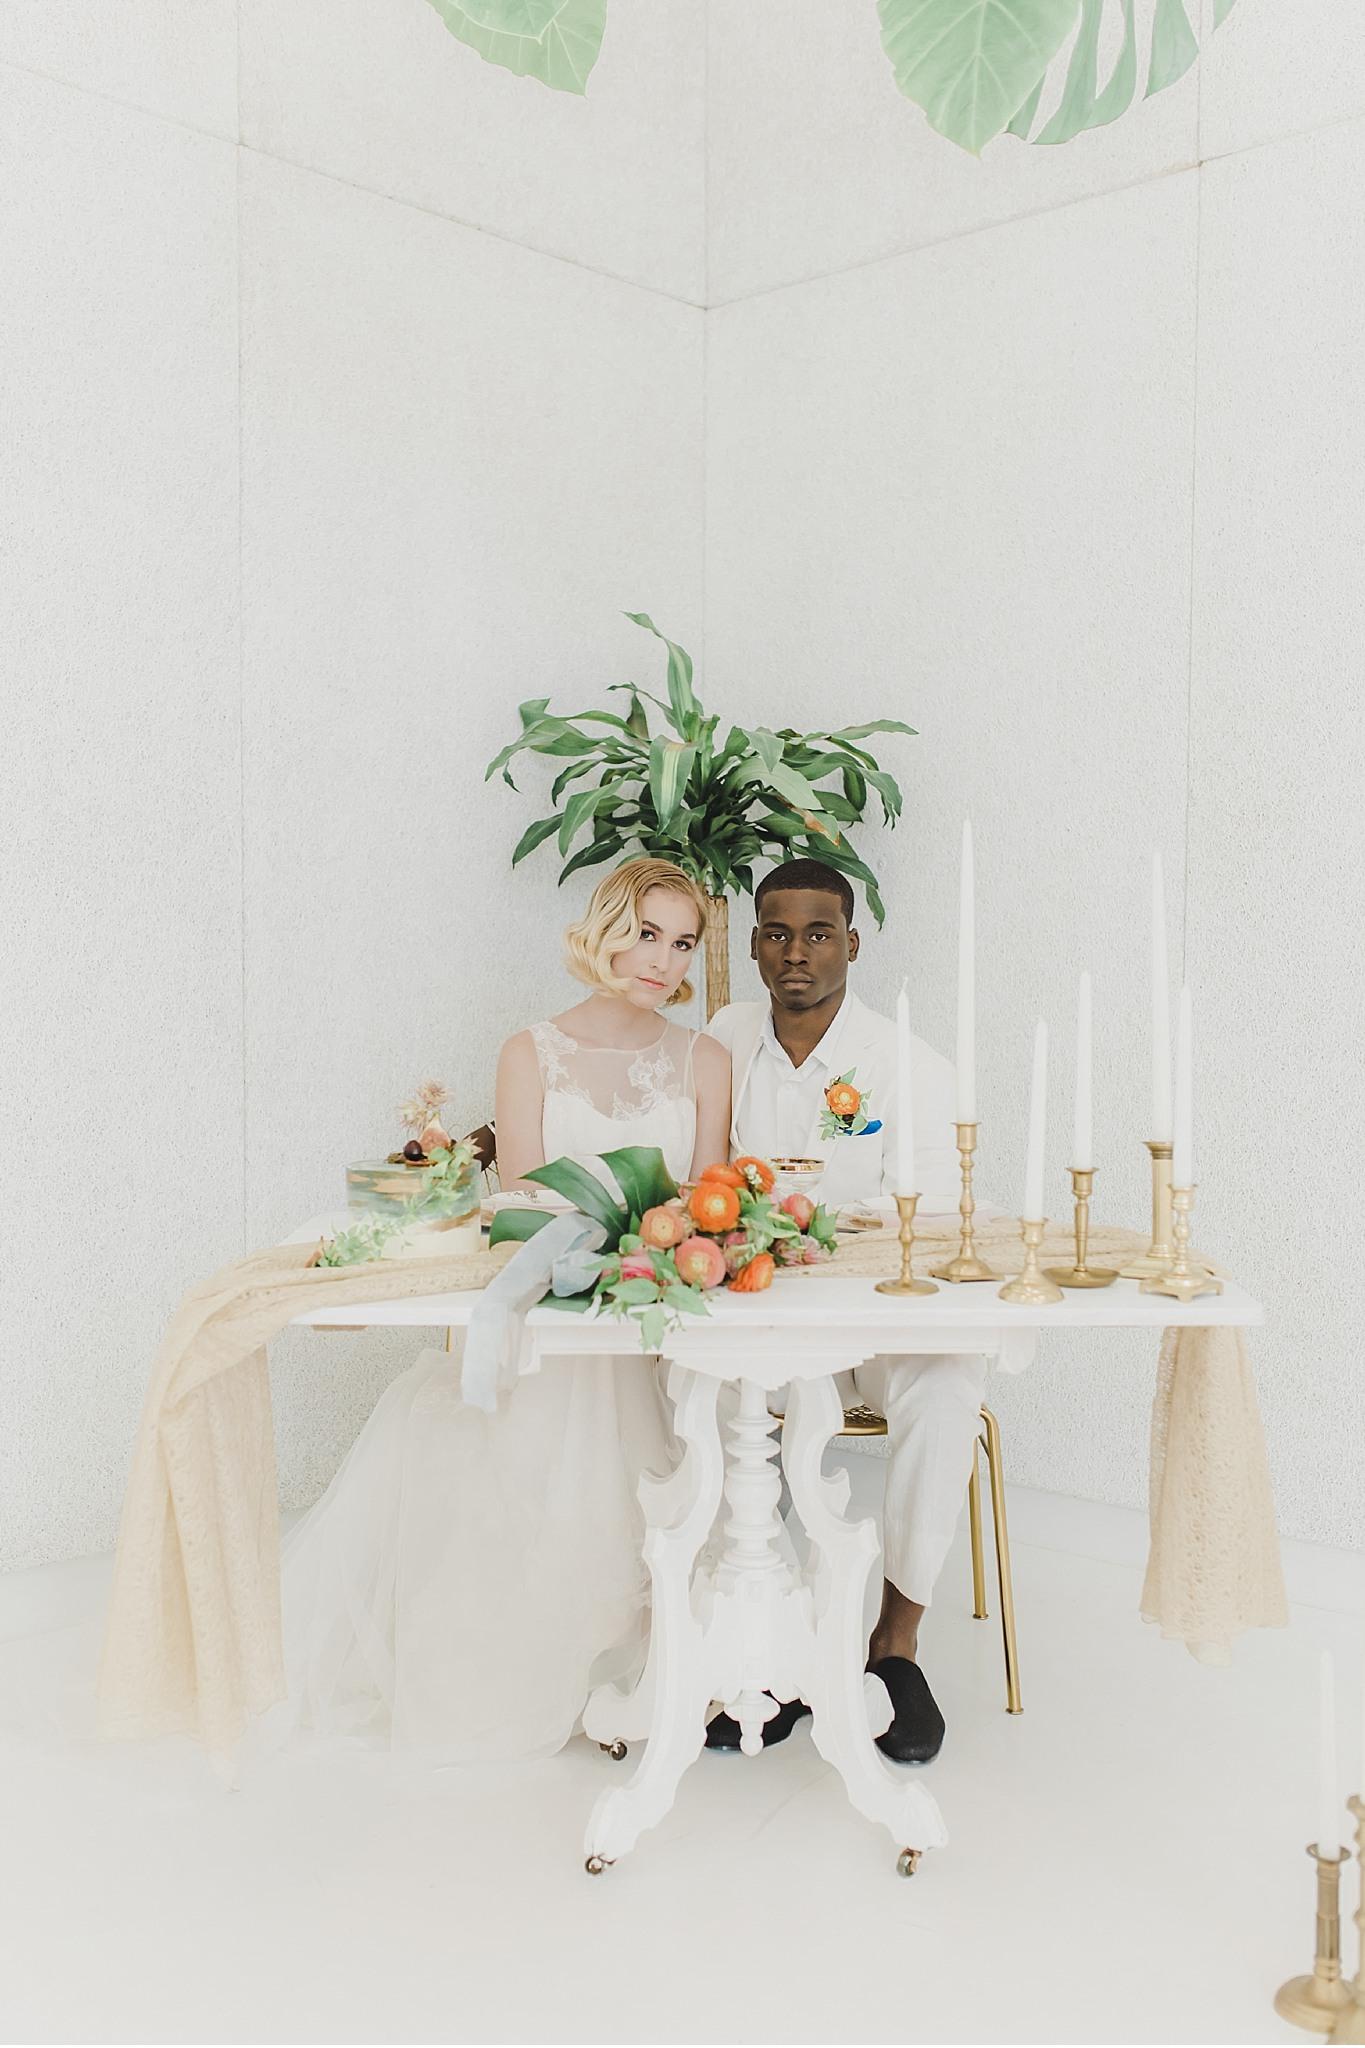 Beautiful Light and Airy Styled Greek Wedding Supply Manheim PA Wedding photography photo_1874.jpg